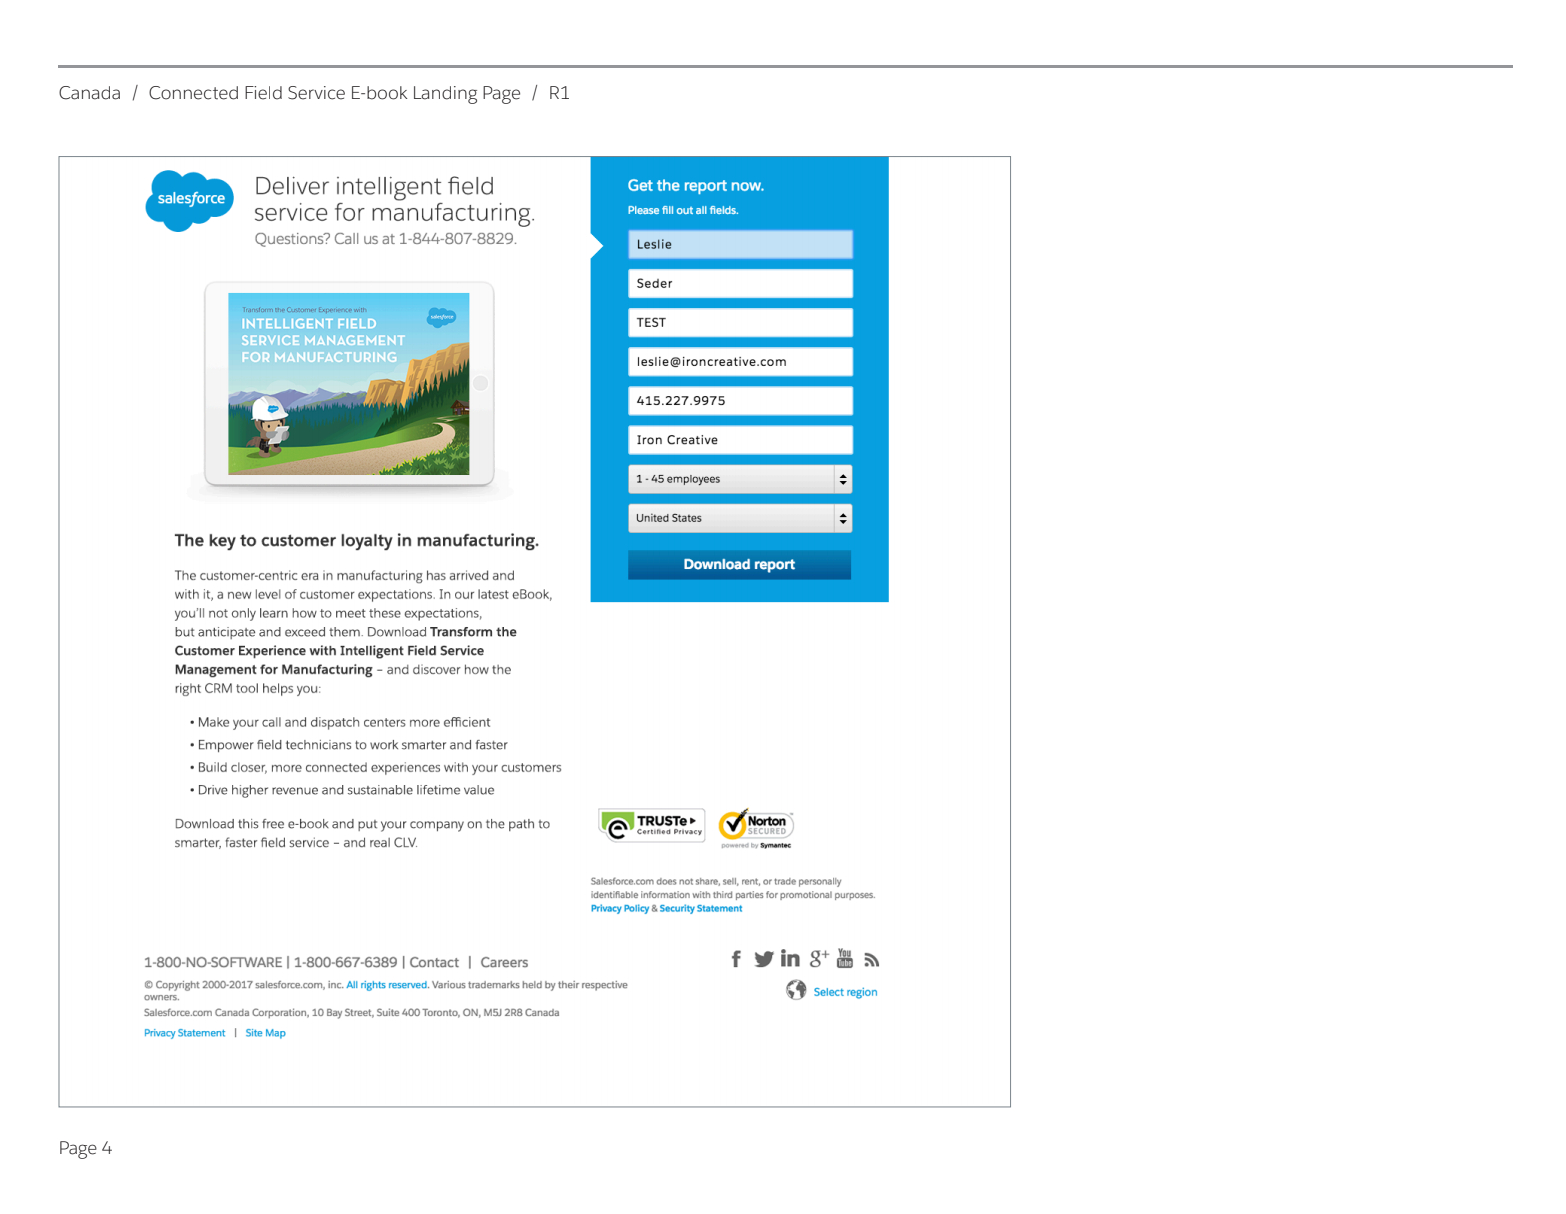 Salesforce Canada Landing Page